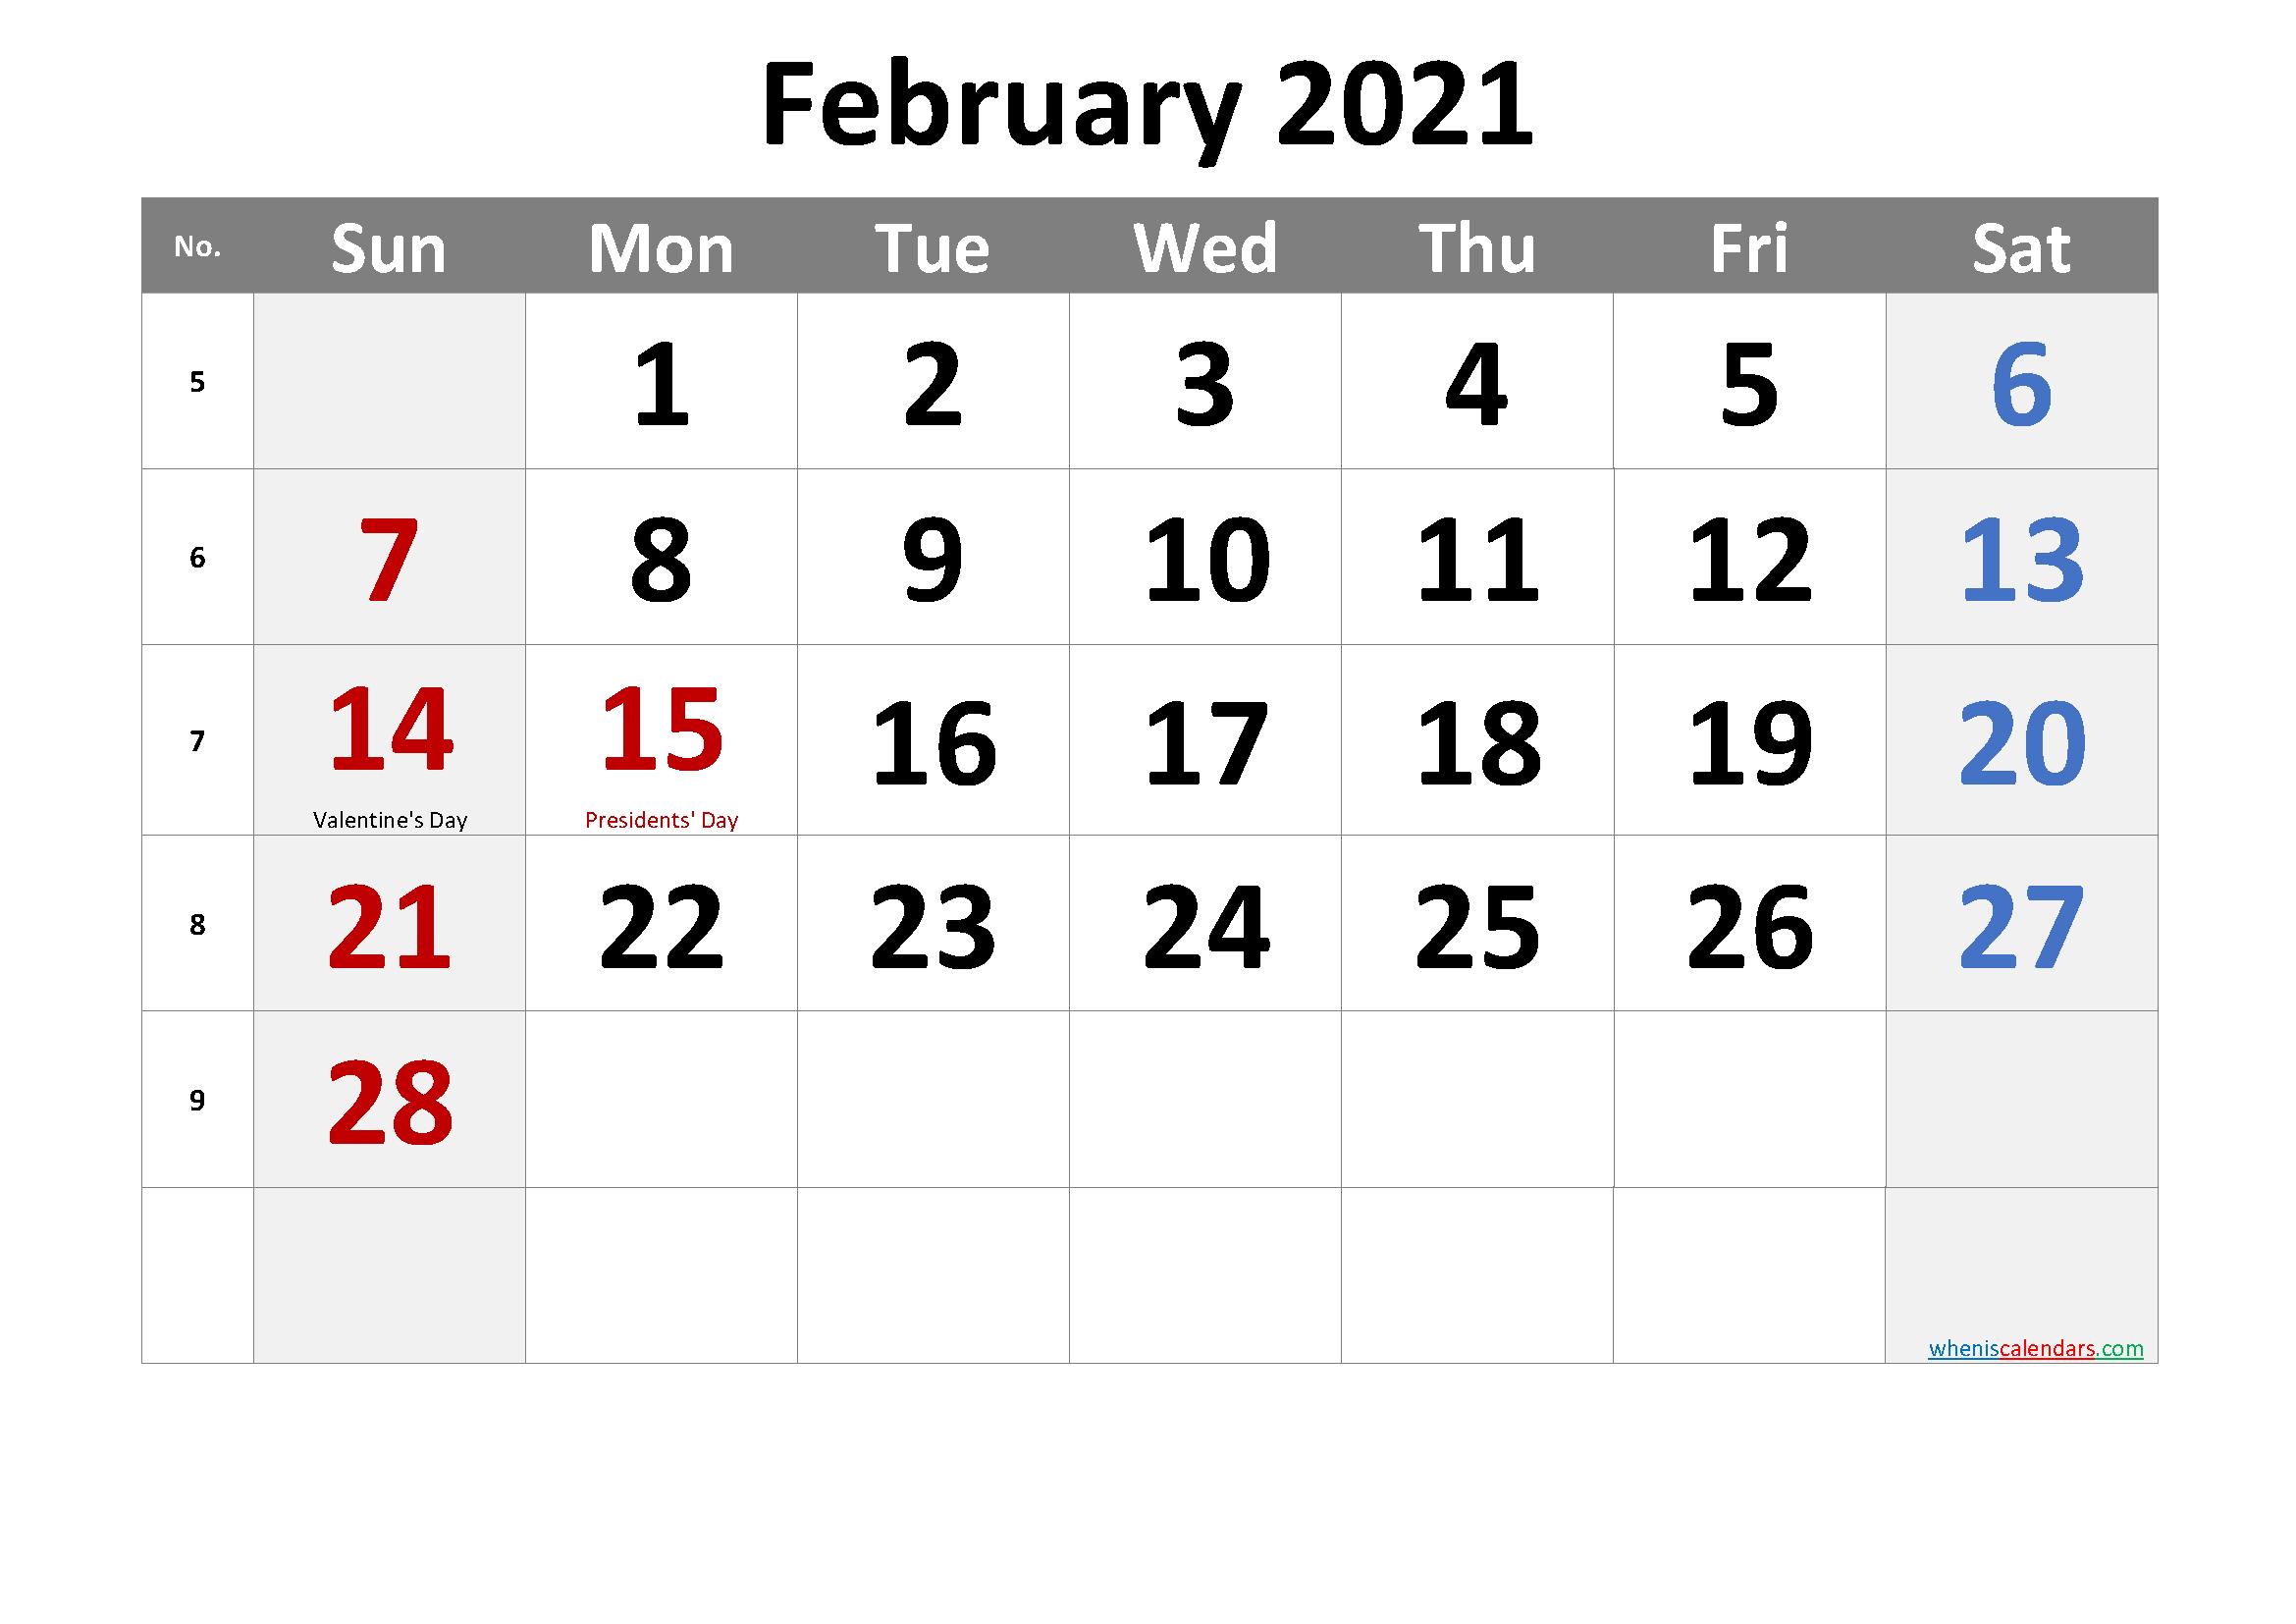 FEBRUARY 2021 Printable Calendar with Holidays